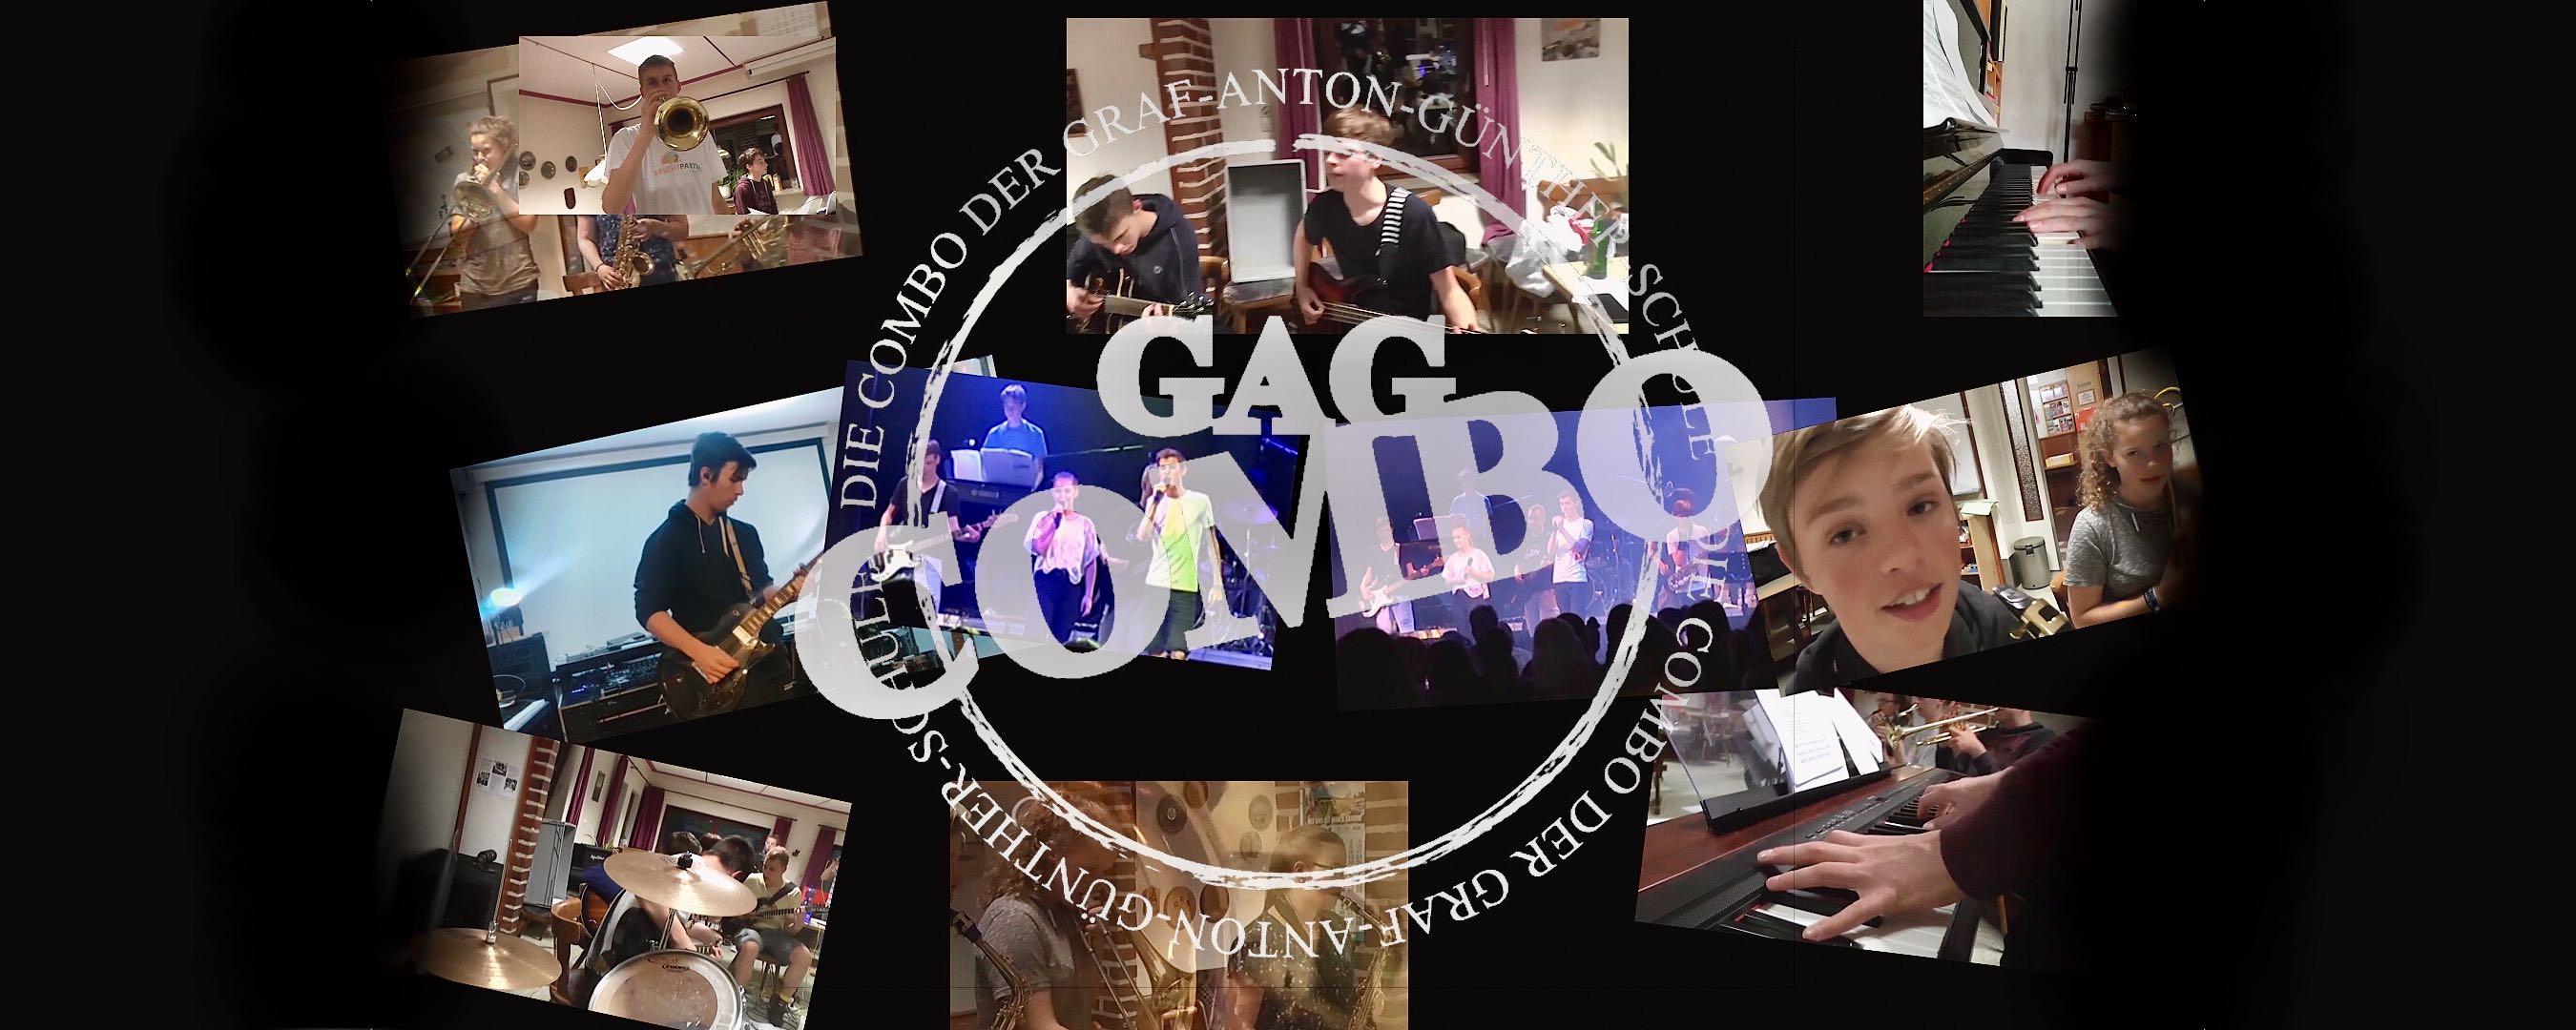 GAG-Combo Projekt Zu Coronazeiten